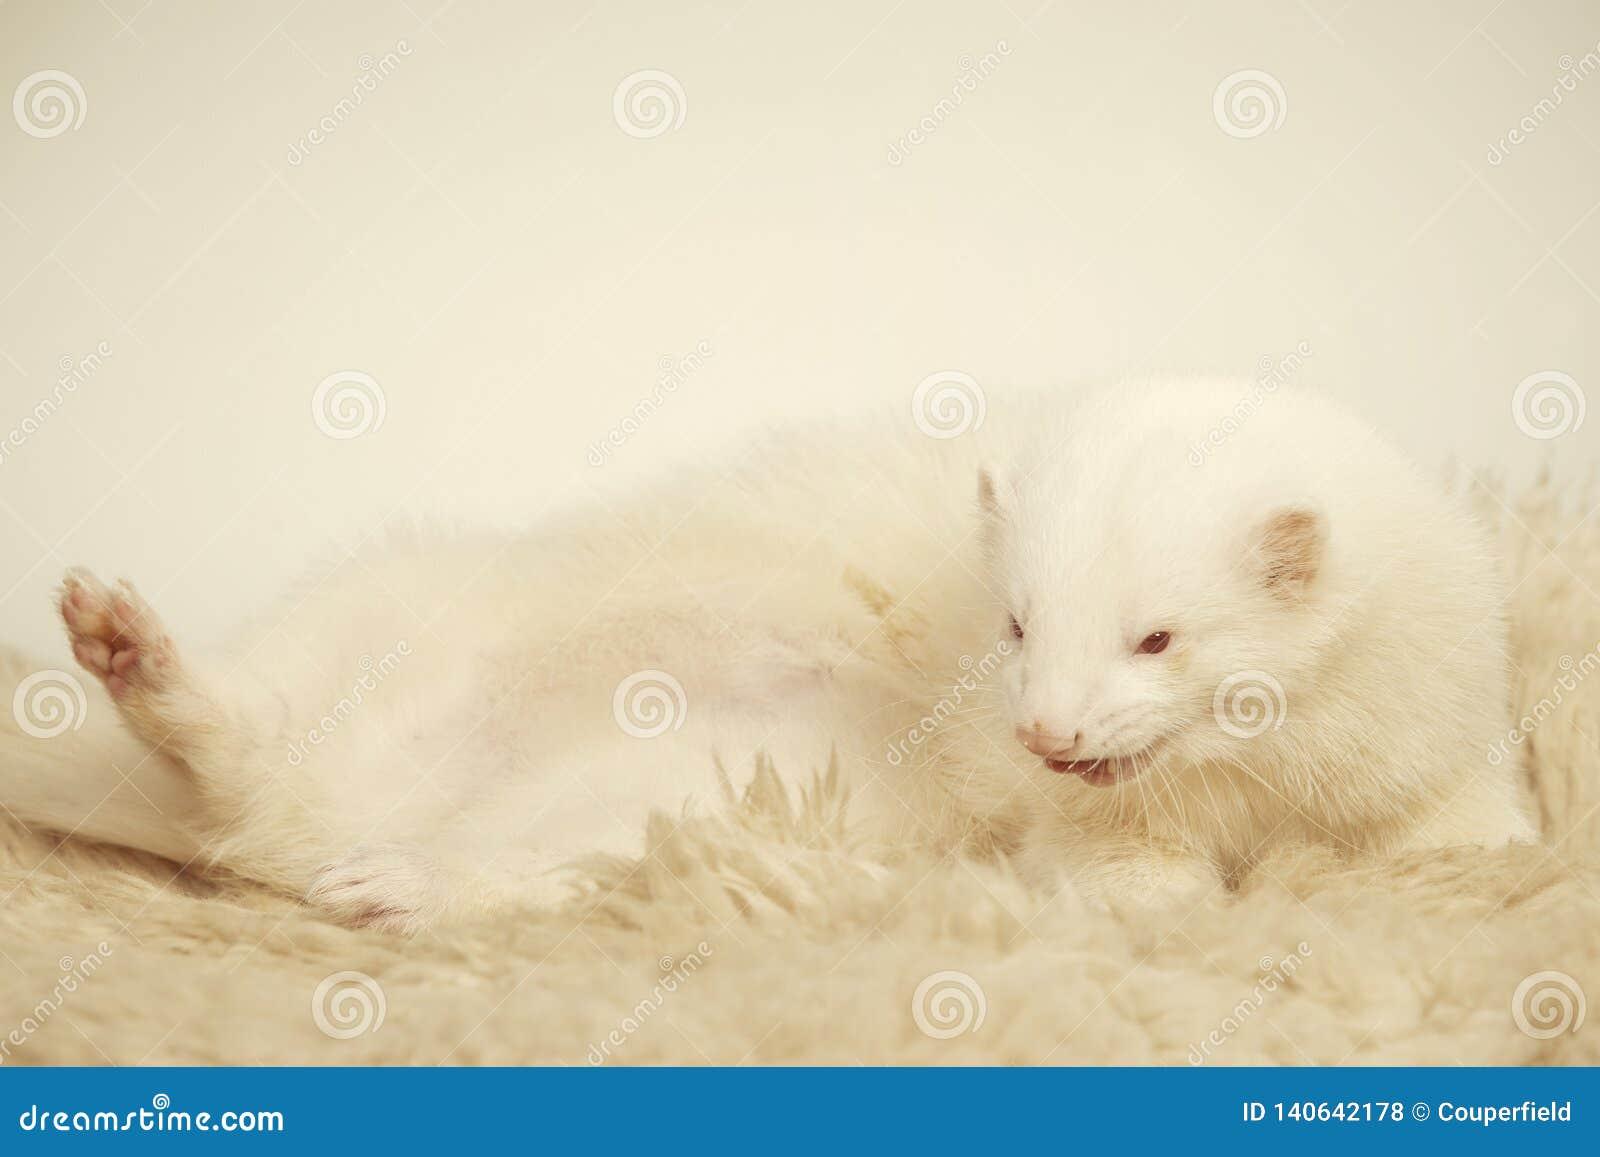 Male albino ferret posing for portrait on fur